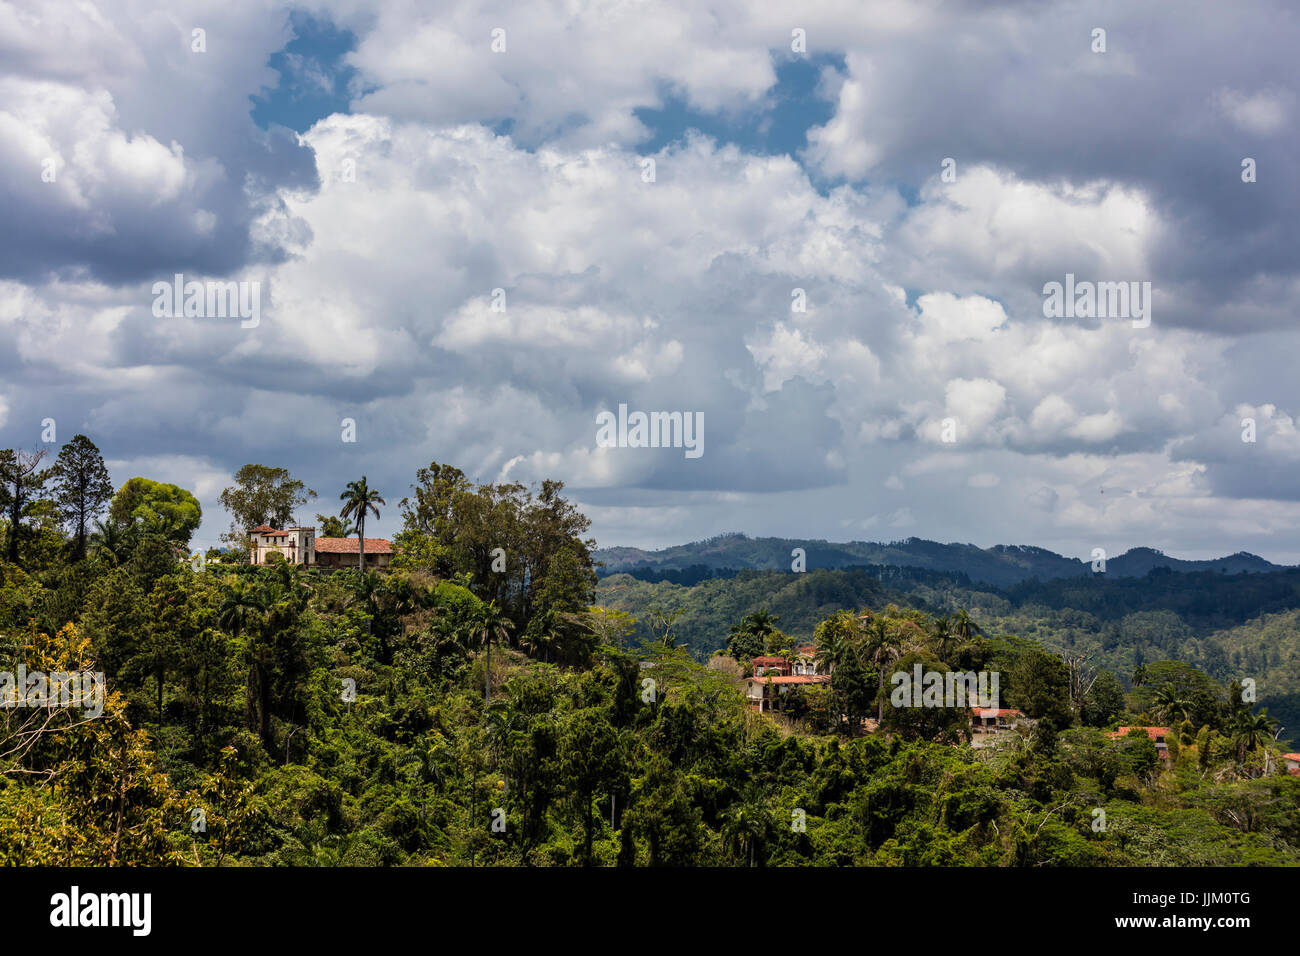 SPANISH MANSION above SALTO DE CABURNI located at TOPES DE COLLANTES in the mountains of SIERRA DEL ESCAMBRAY - - Stock Image